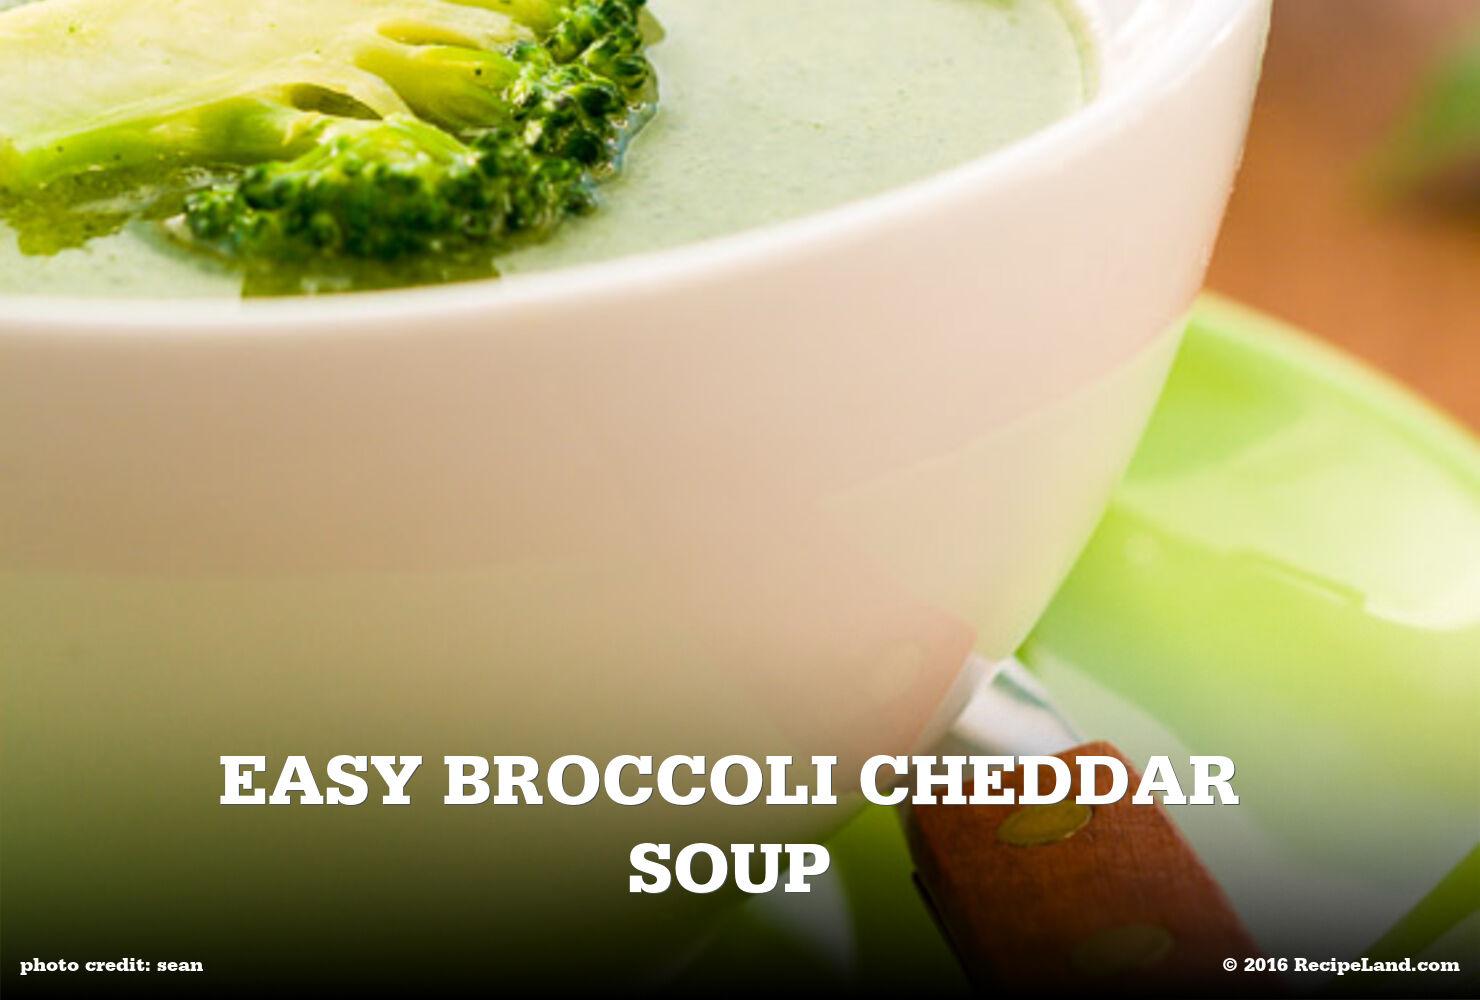 Easy Broccoli Cheddar Soup